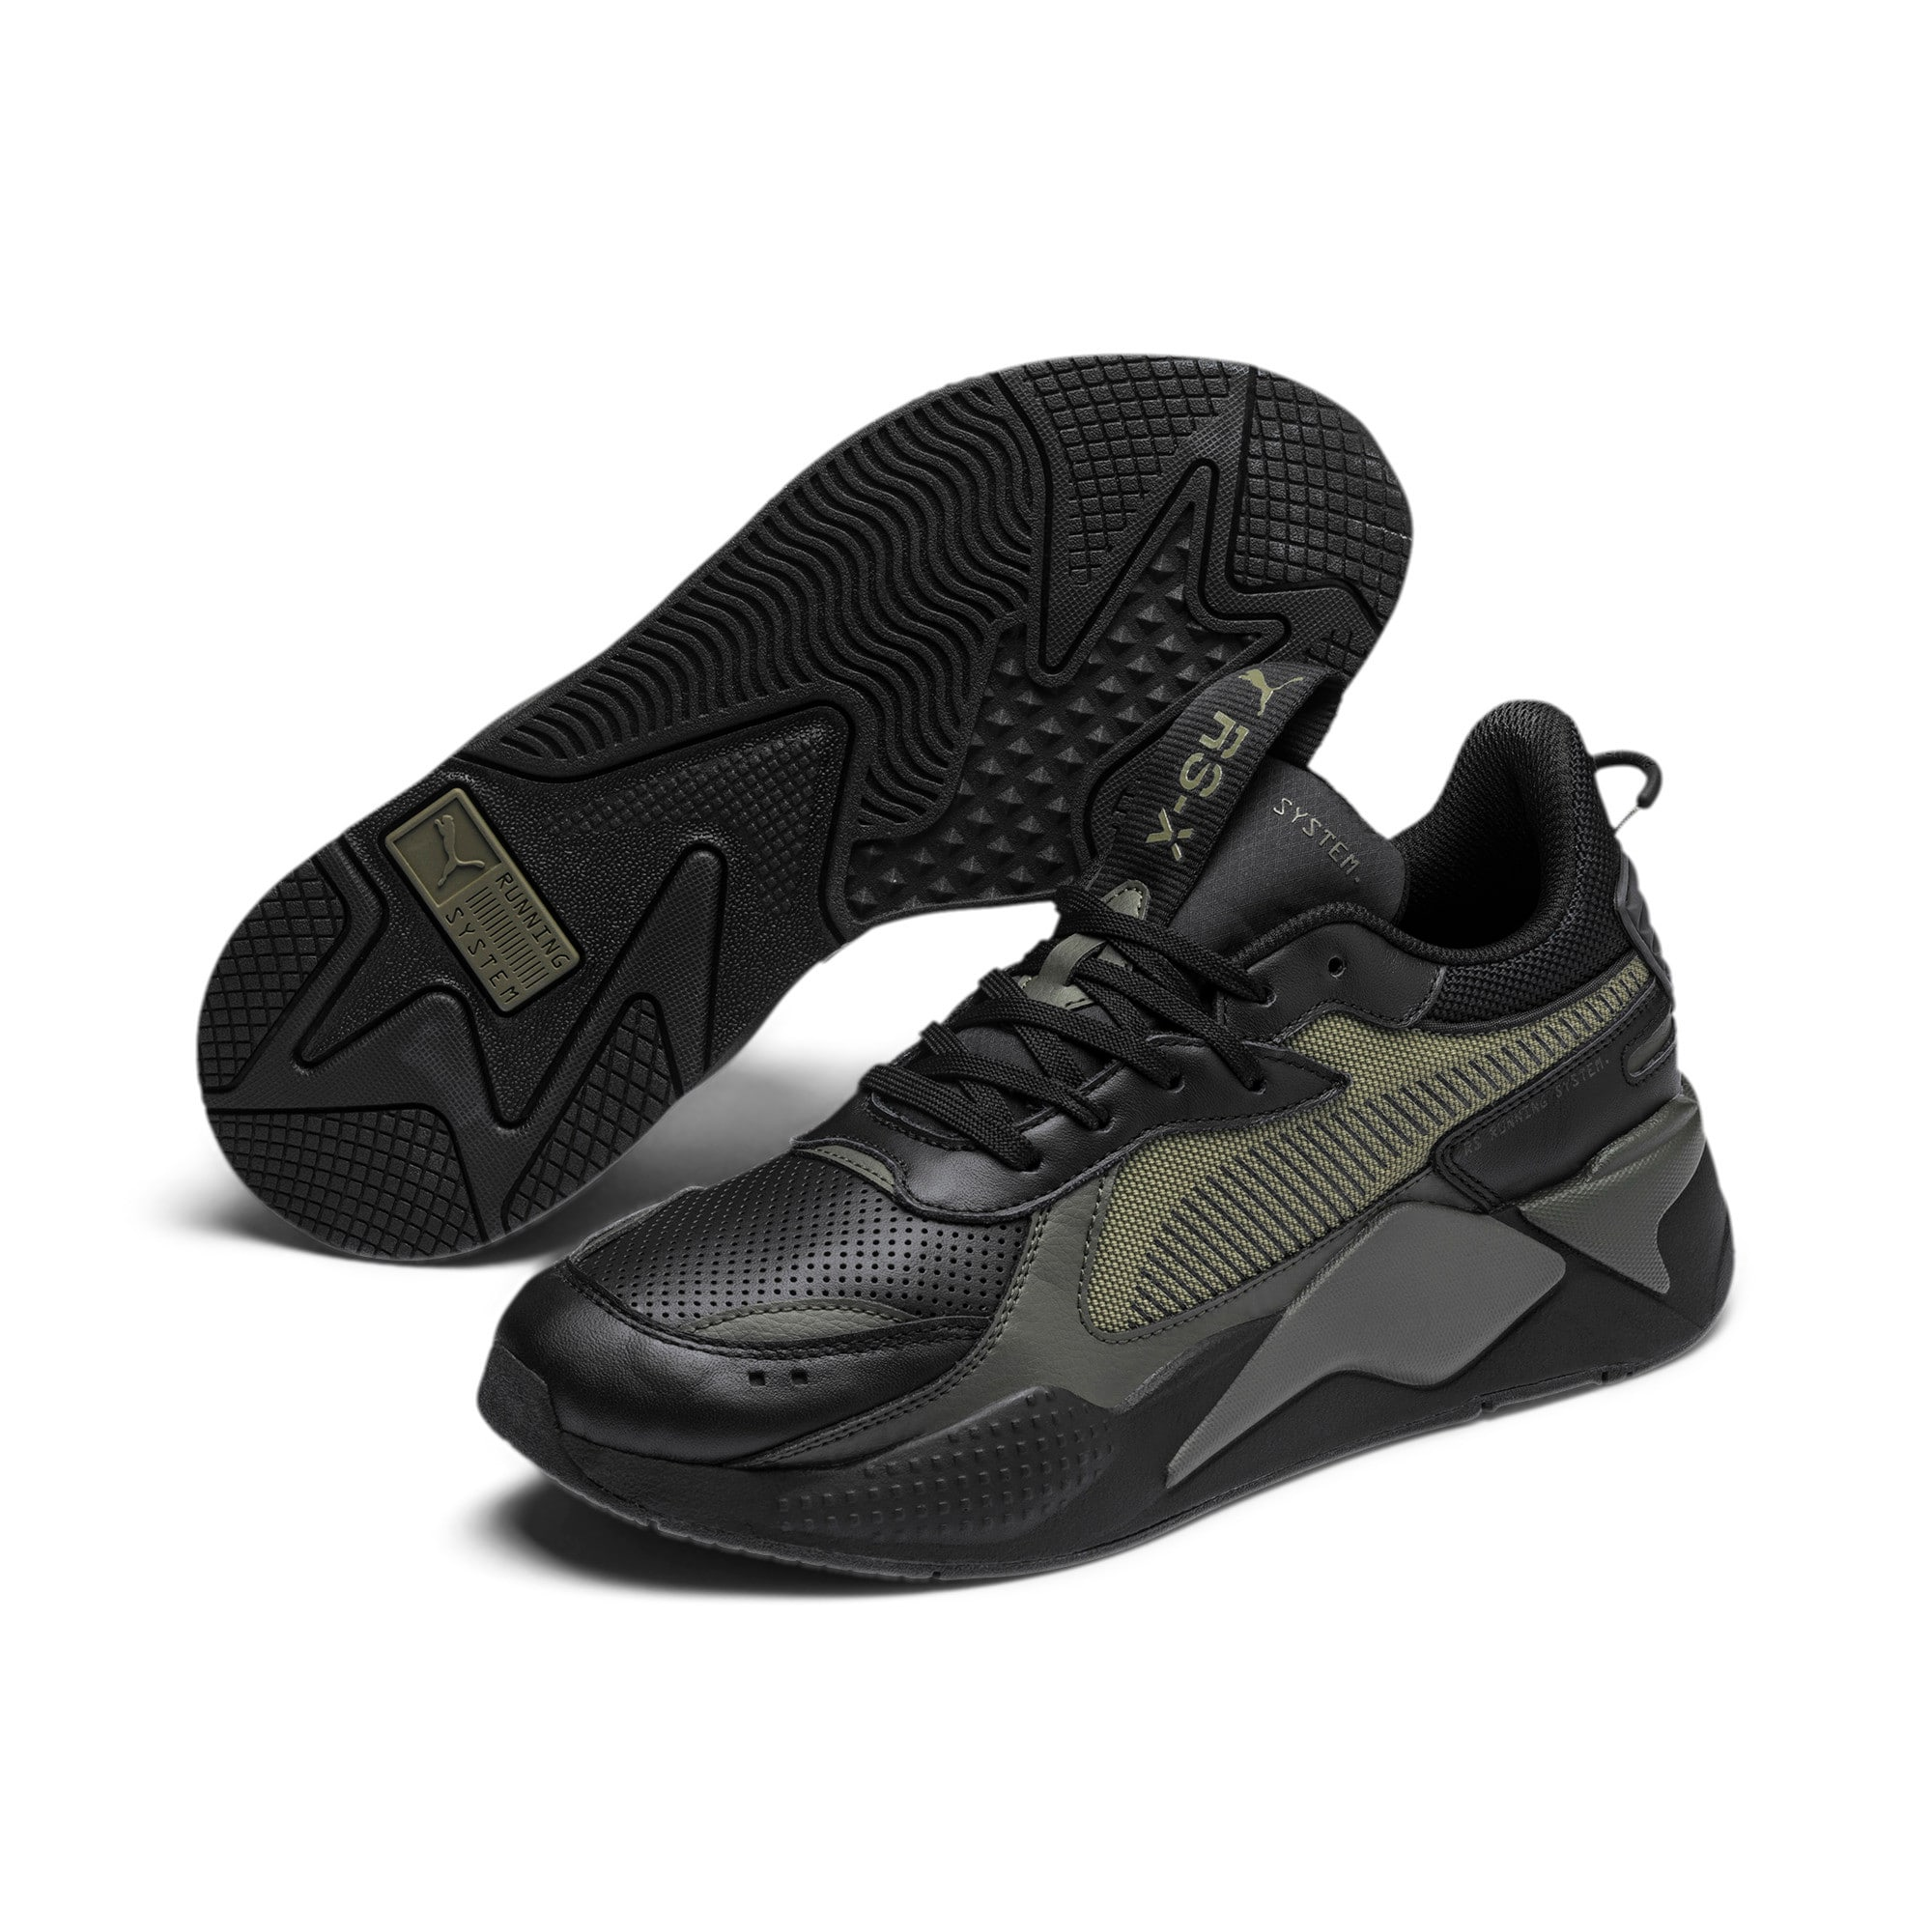 Thumbnail 3 of RS-X Winterized Sneakers, Puma Black-Burnt Olive, medium